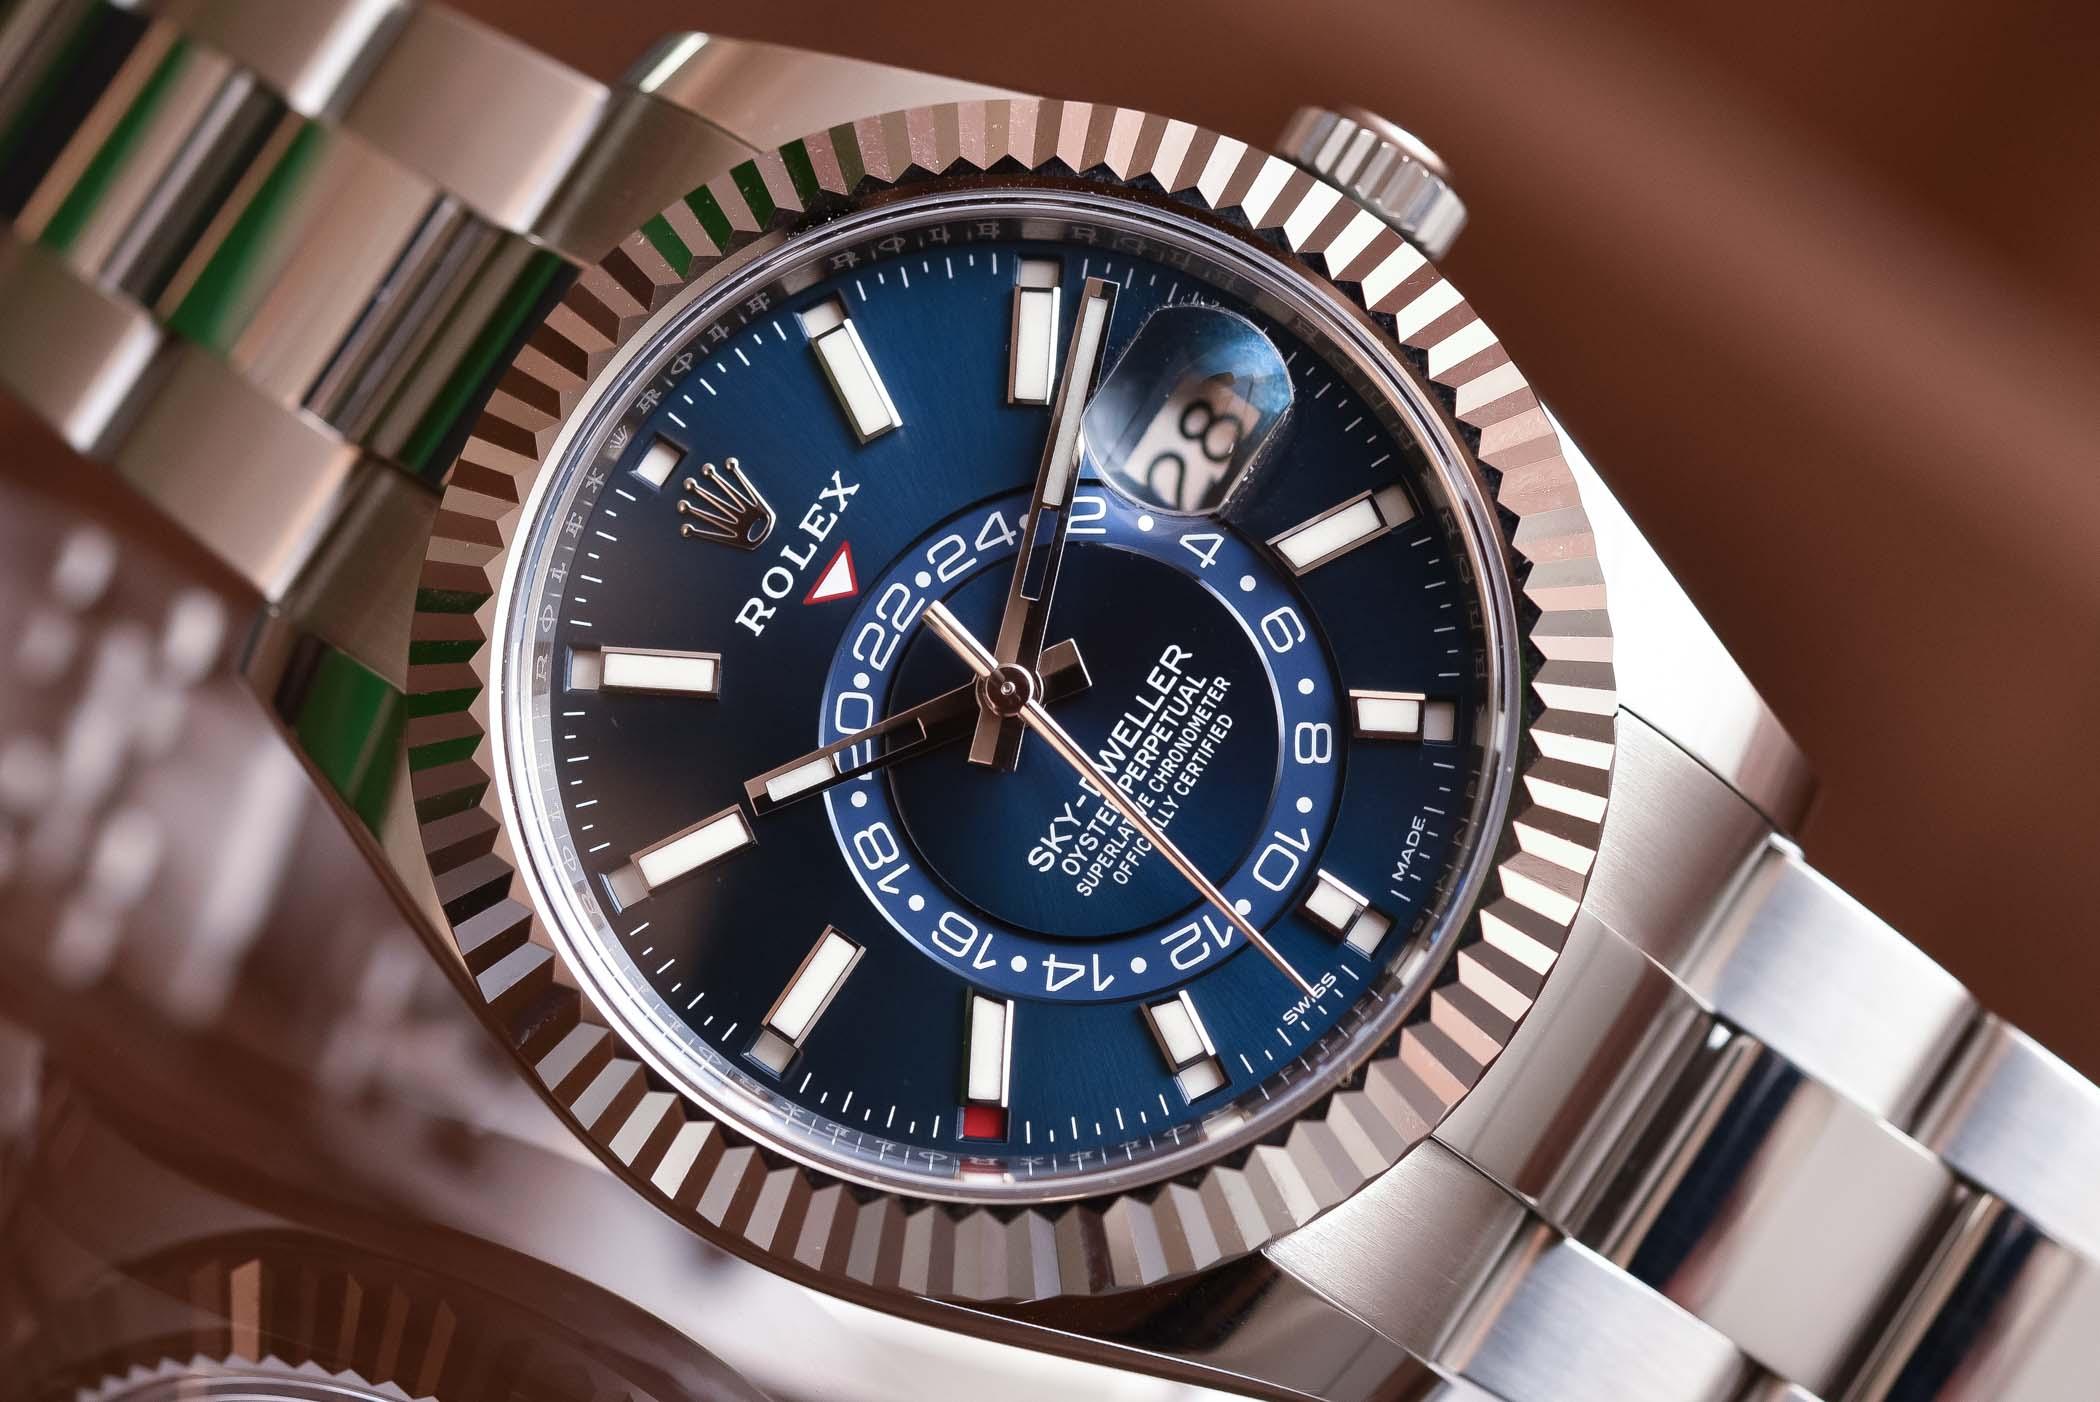 Vintage Rolex Watches For Sale  Rare Rolex Watch